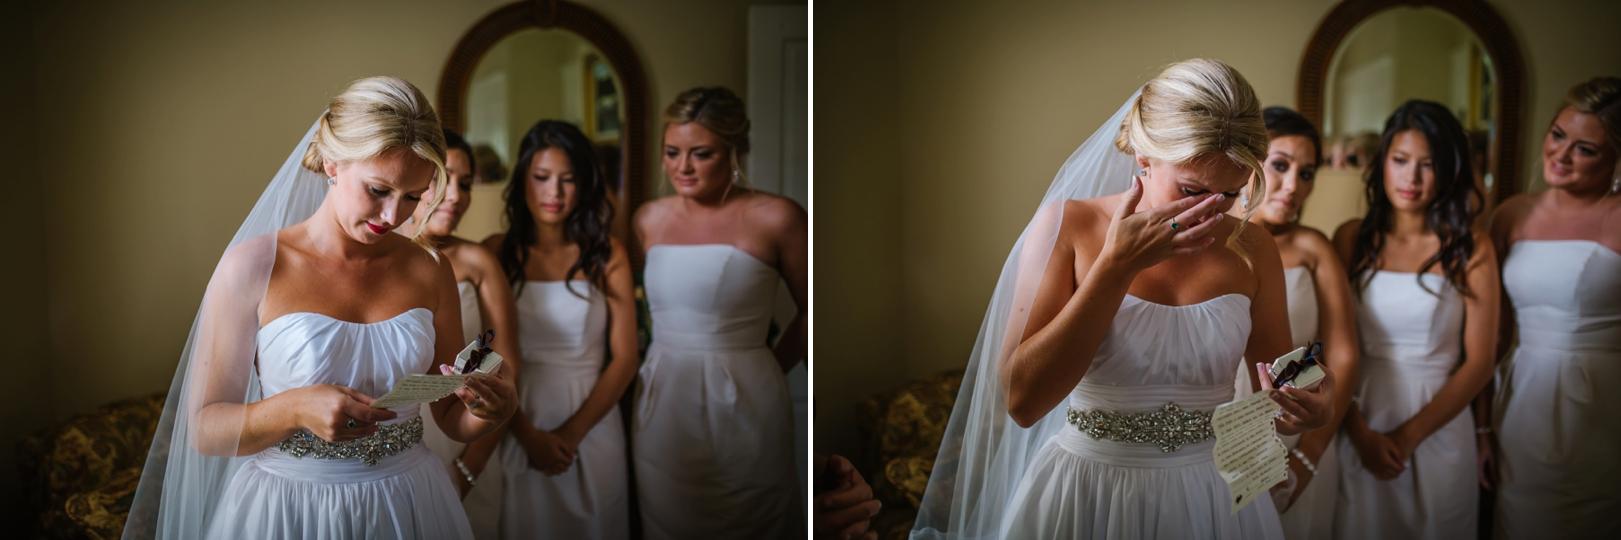 preppy-southern-plantation-wedding-georgia_0010.jpg